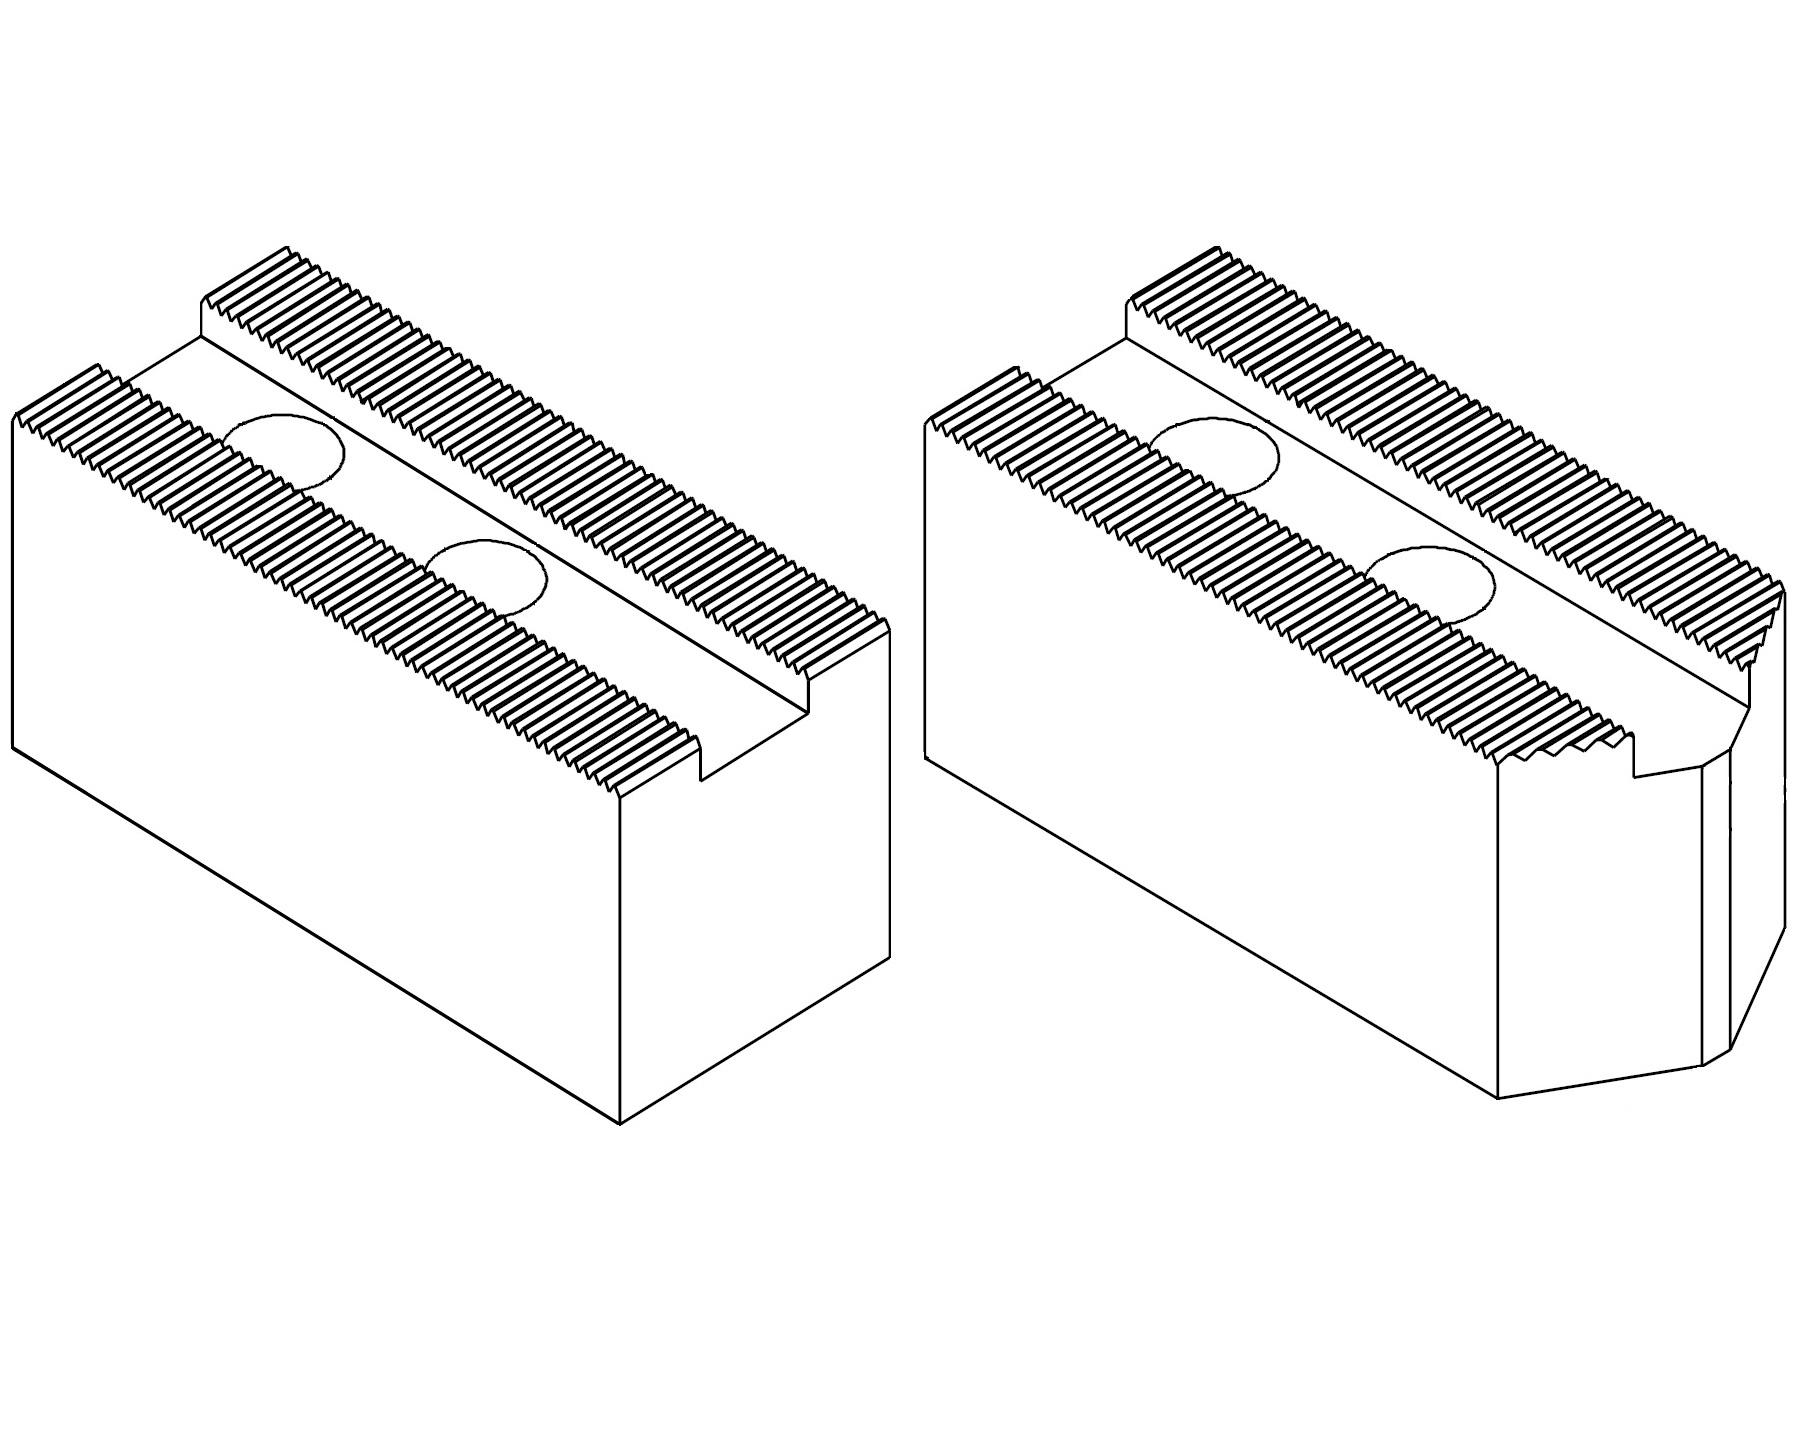 "Čelisti měkké 1/16""x90°, šířka drážky - 8 (sklíčidla pr. 110mm)"